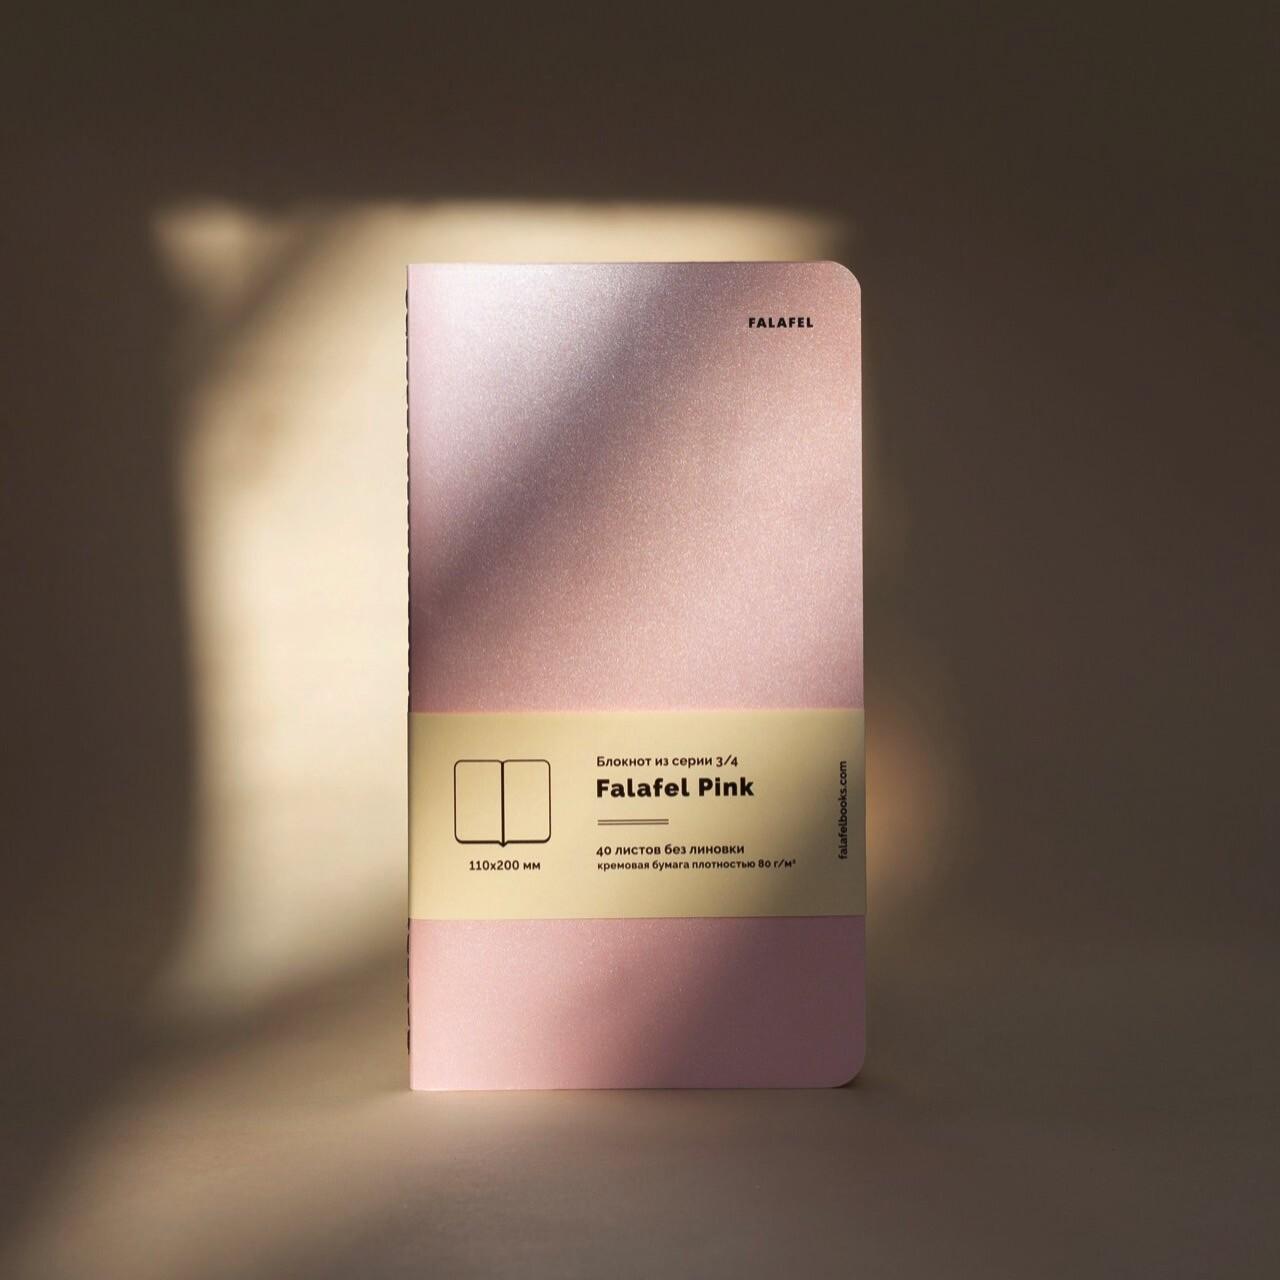 Falafelbooks 3/4 Pink